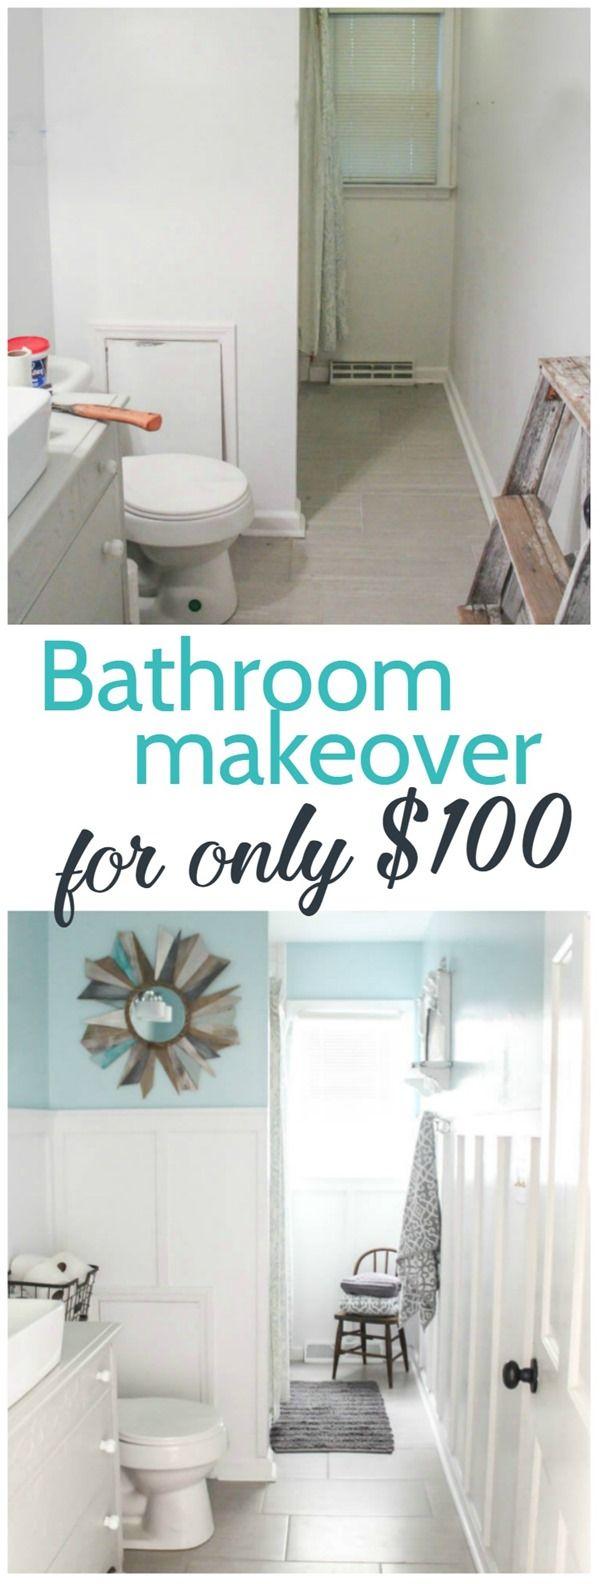 542 best DIY Bathroom Ideas images on Pinterest | Bathroom ...